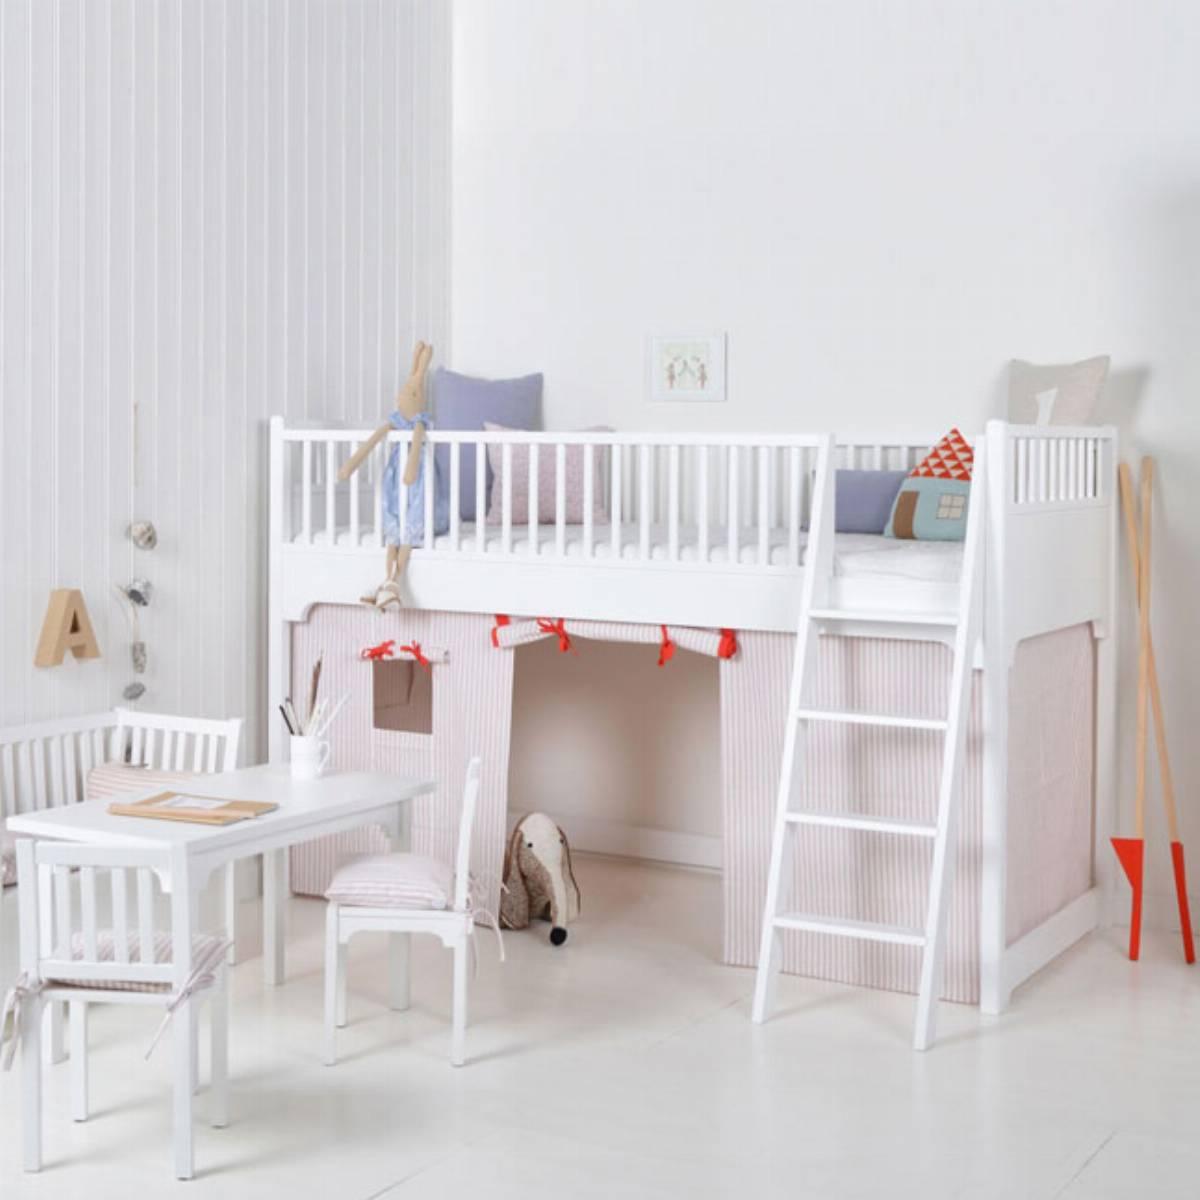 Pokoj dla dziecka - Scandinavian Living (7)